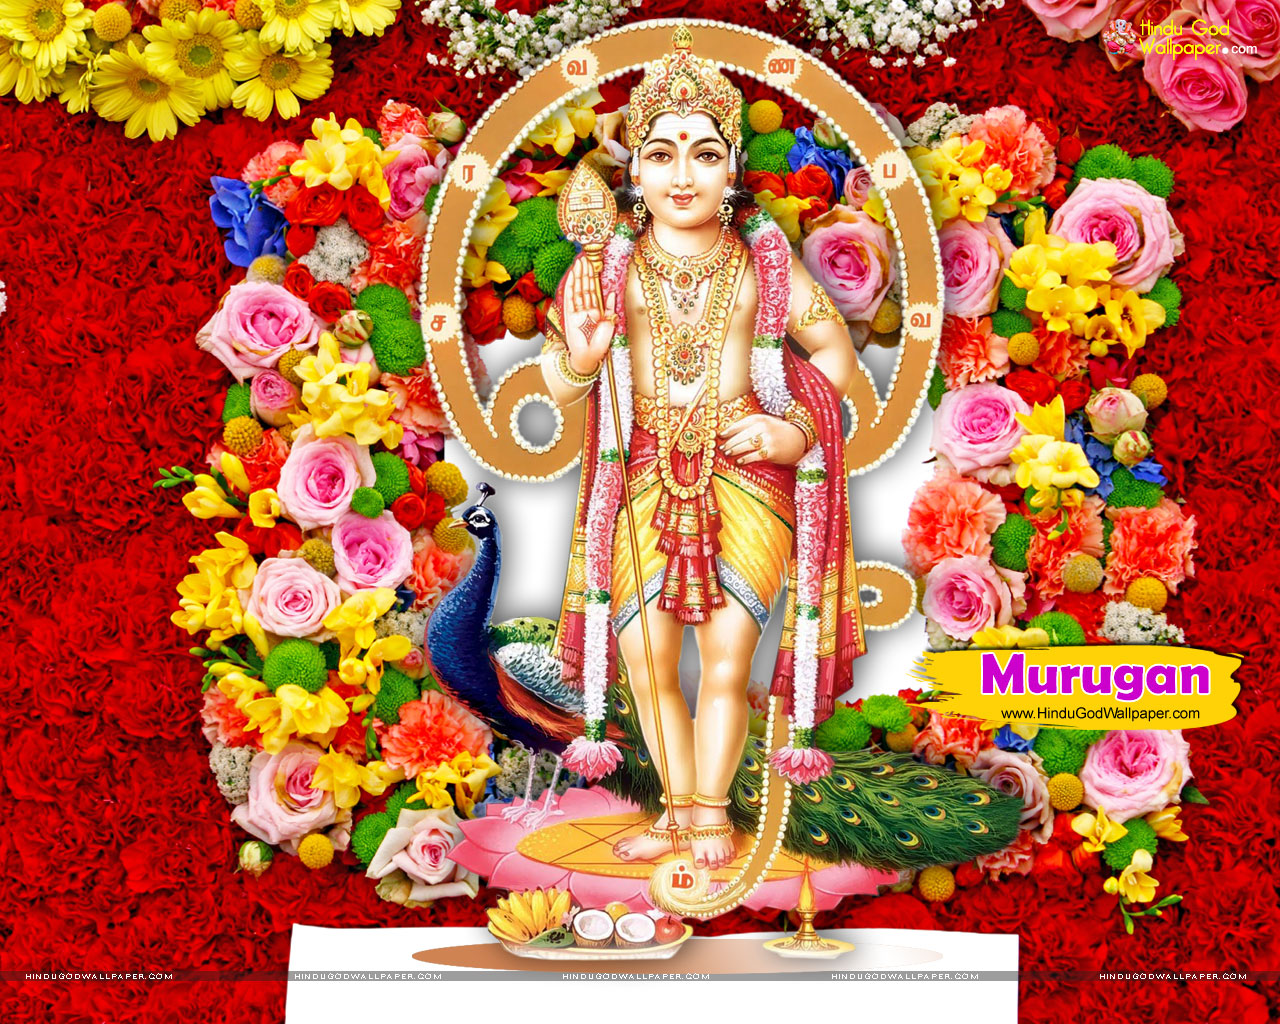 Lord murugan live wallpaper free download thecheapjerseys Gallery